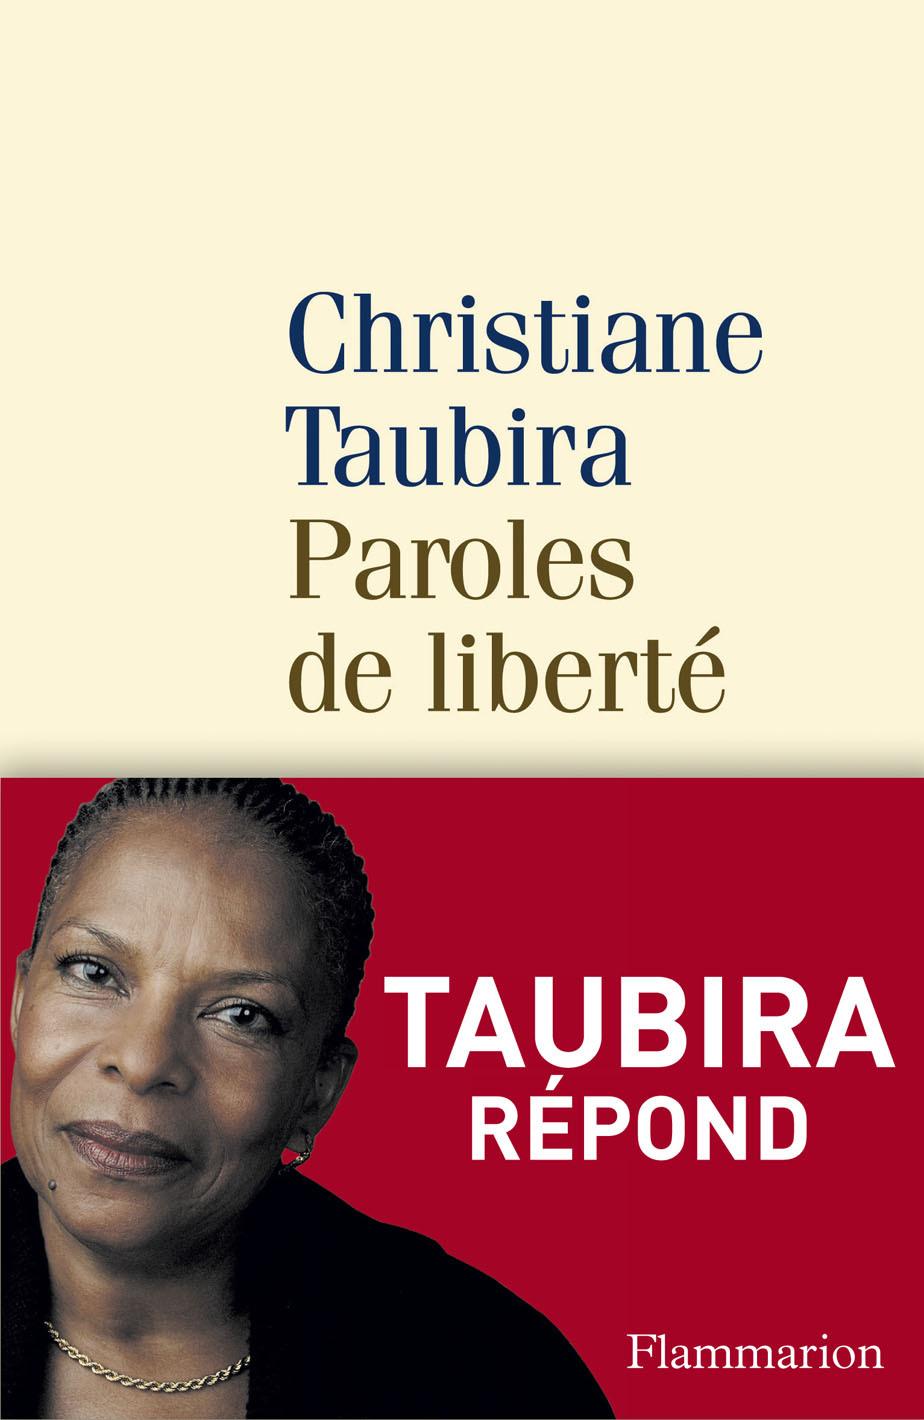 Paroles de liberté | Taubira, Christiane